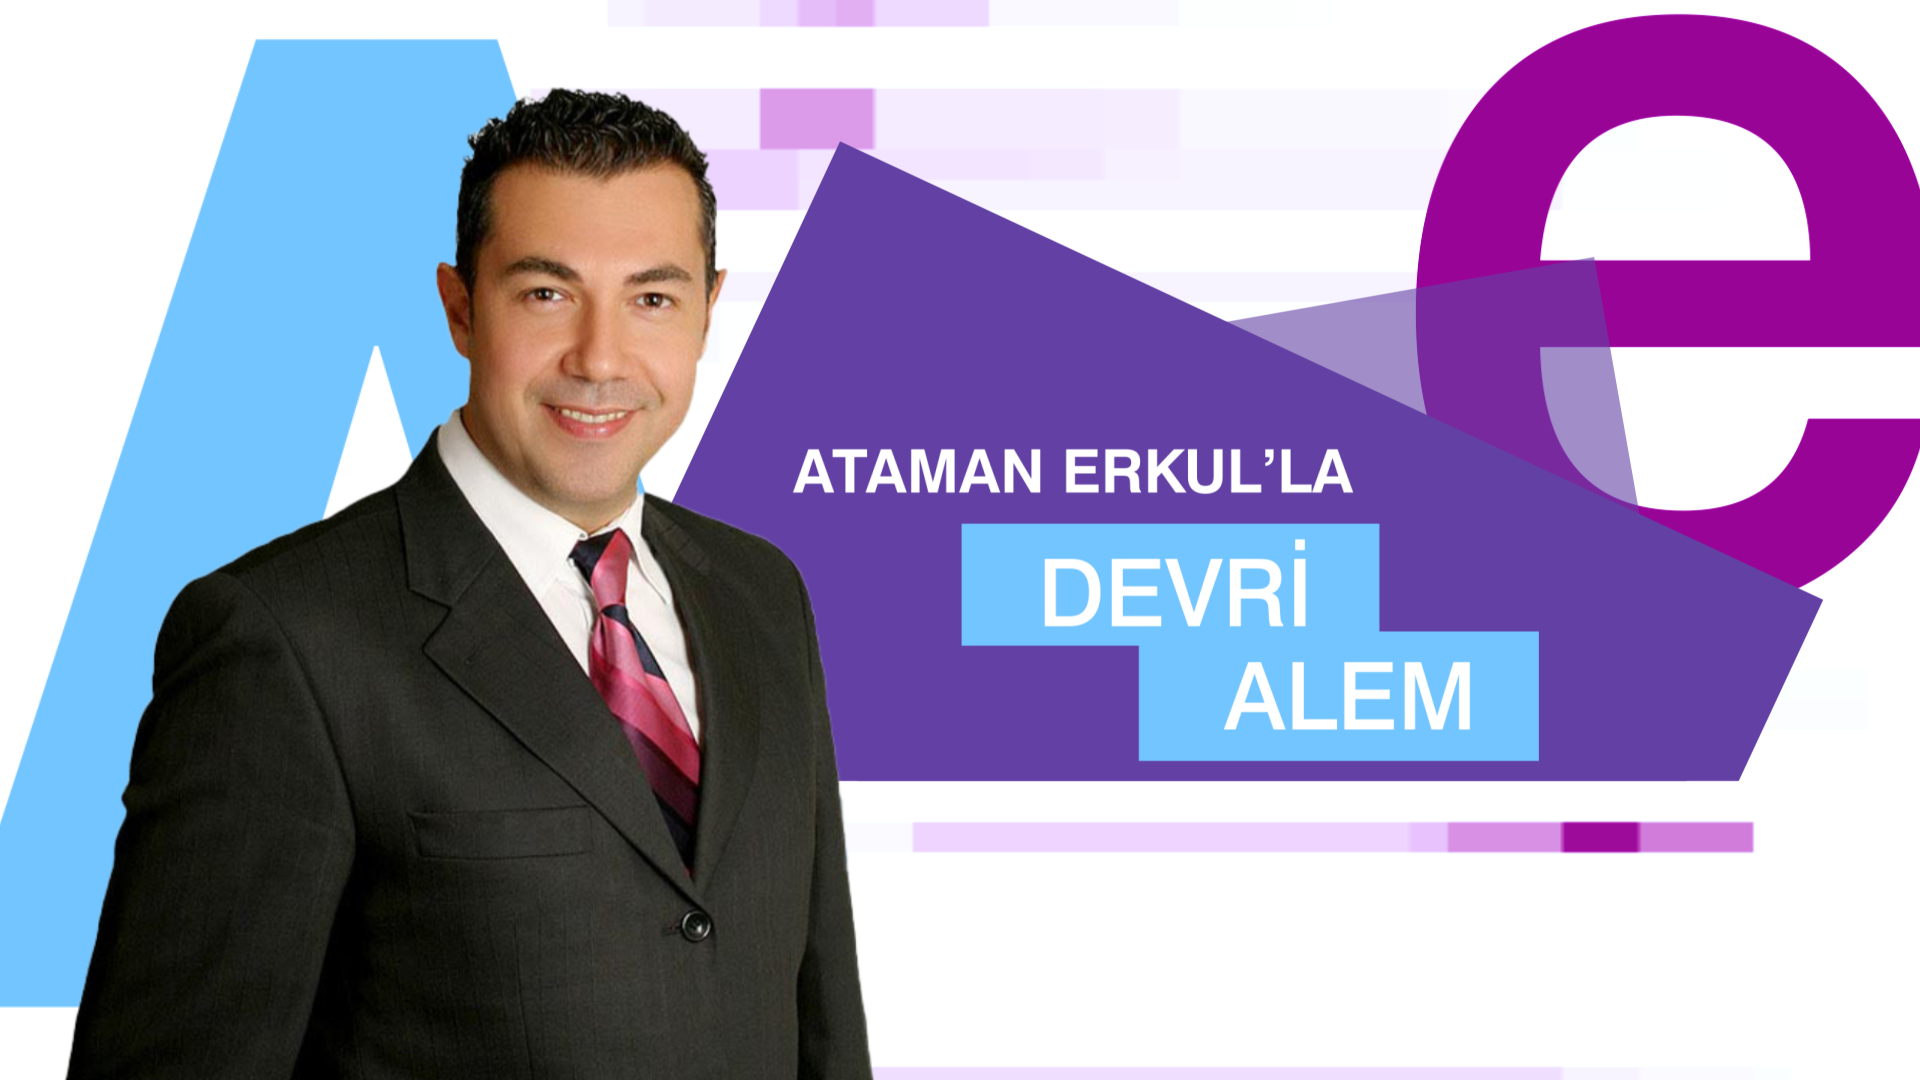 Ataman Erkul'la Devri Alem